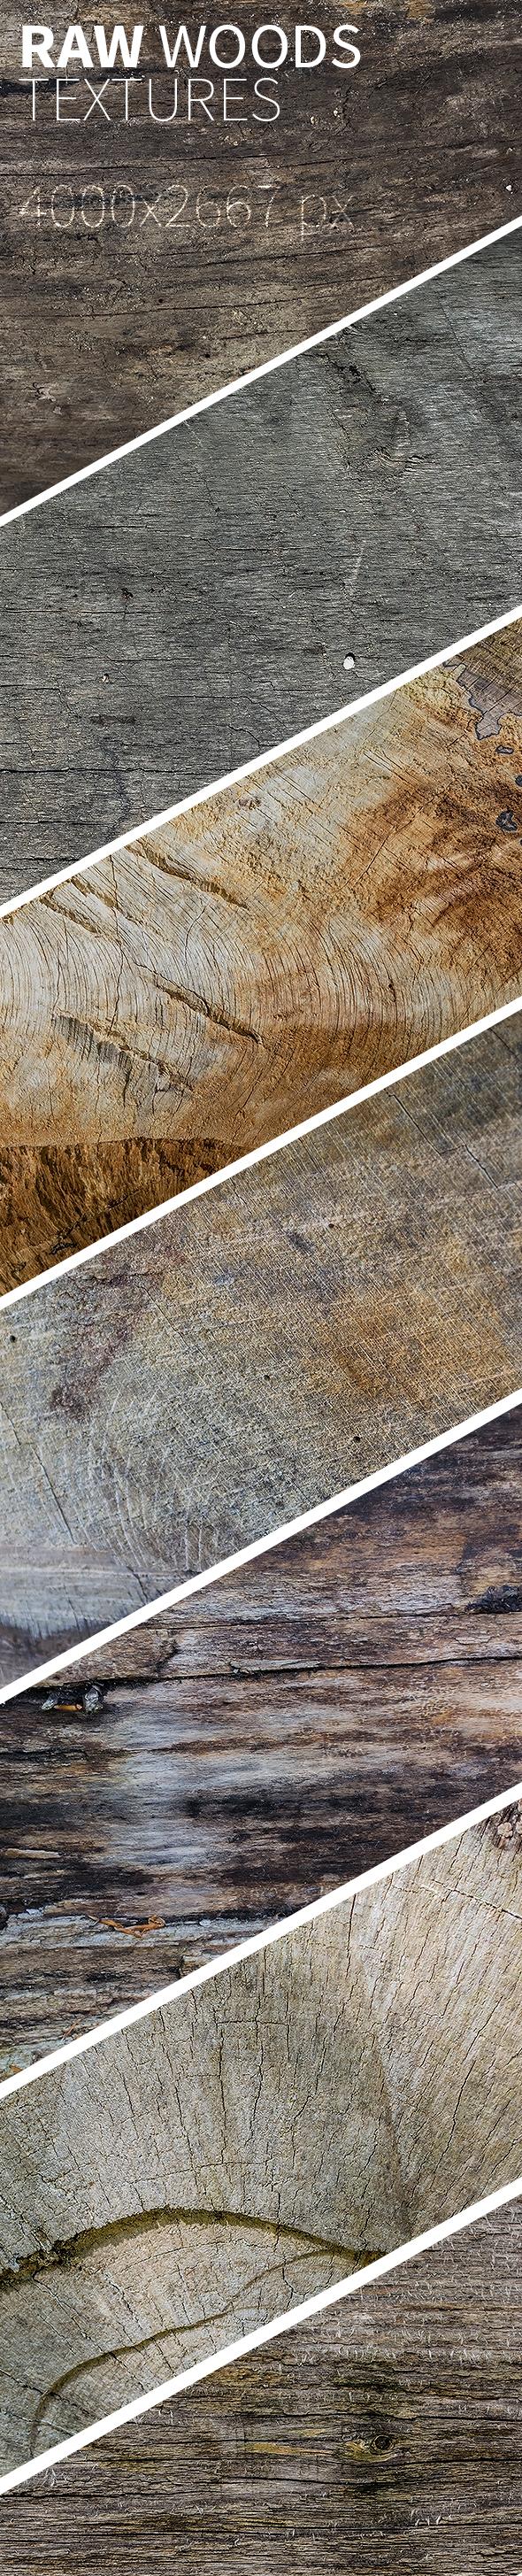 raw wood textures